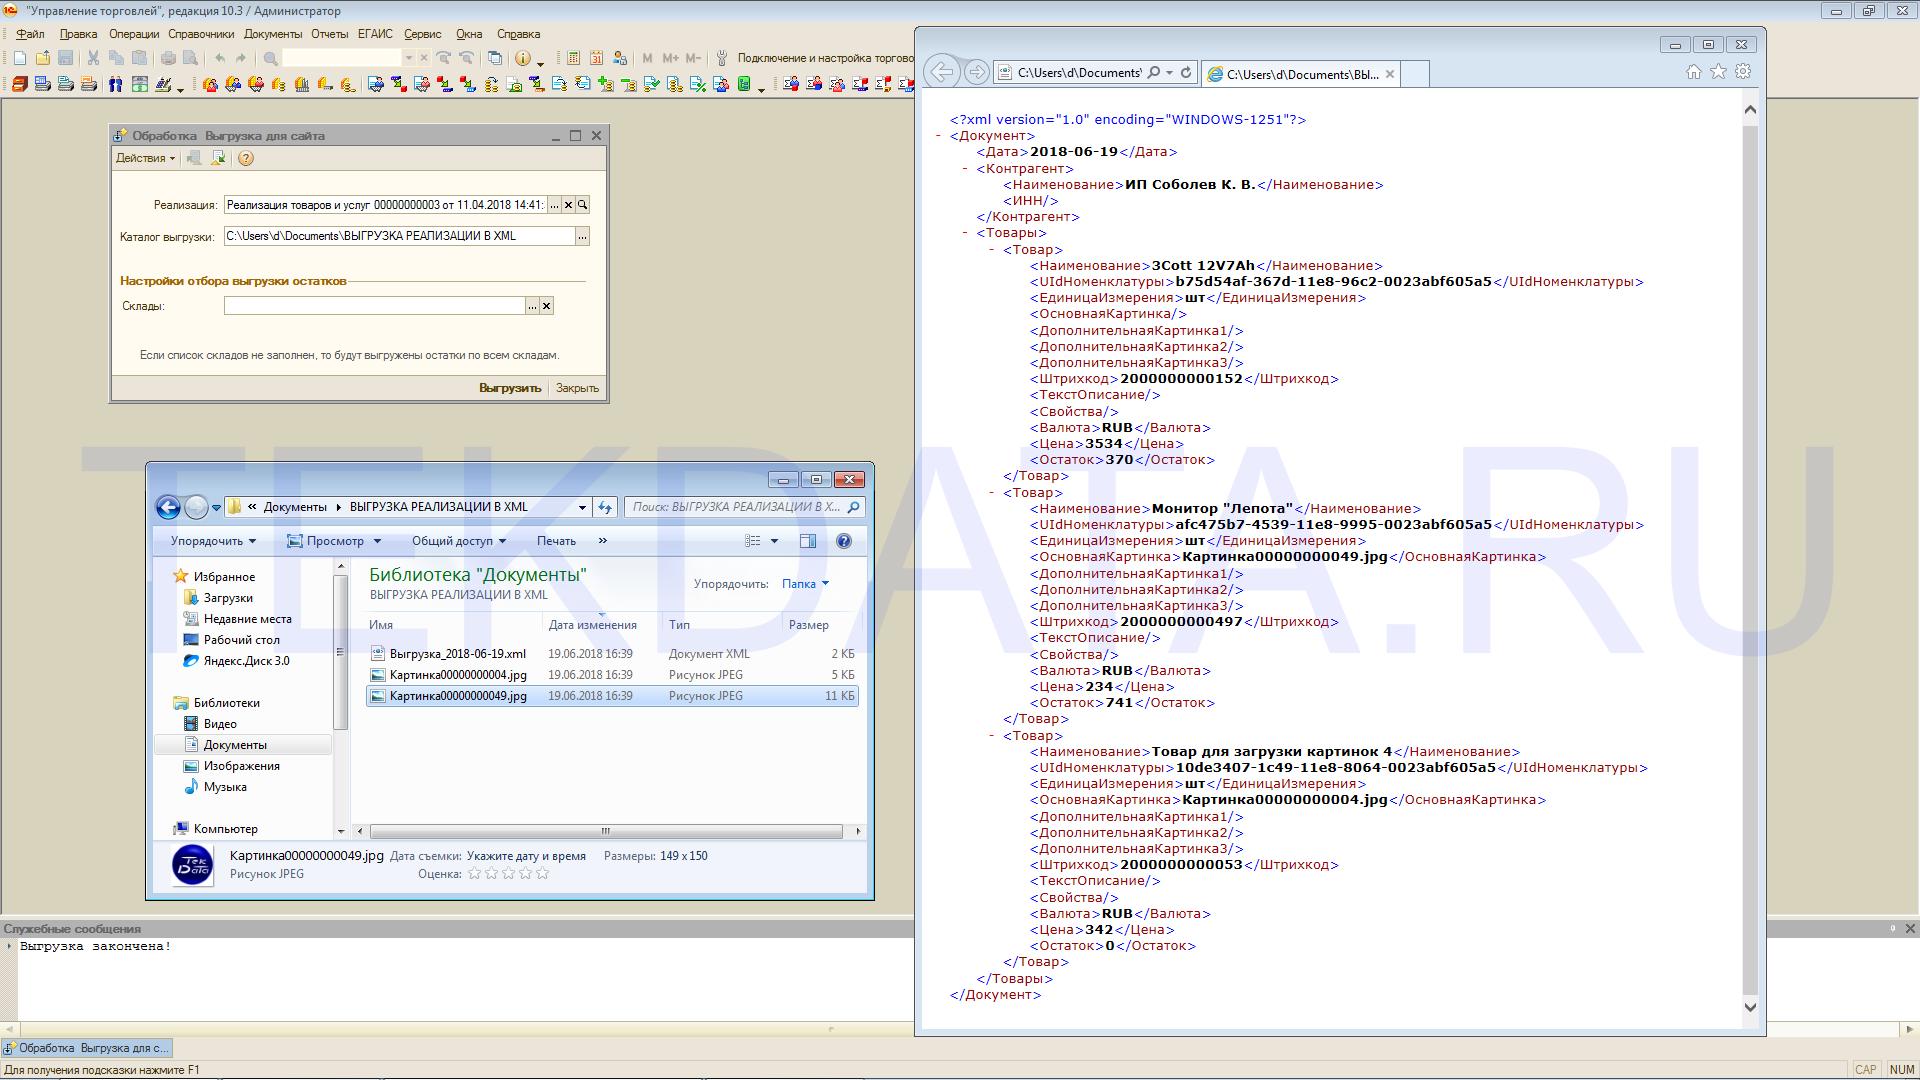 Выгрузка реализации в XML 1С 8.2